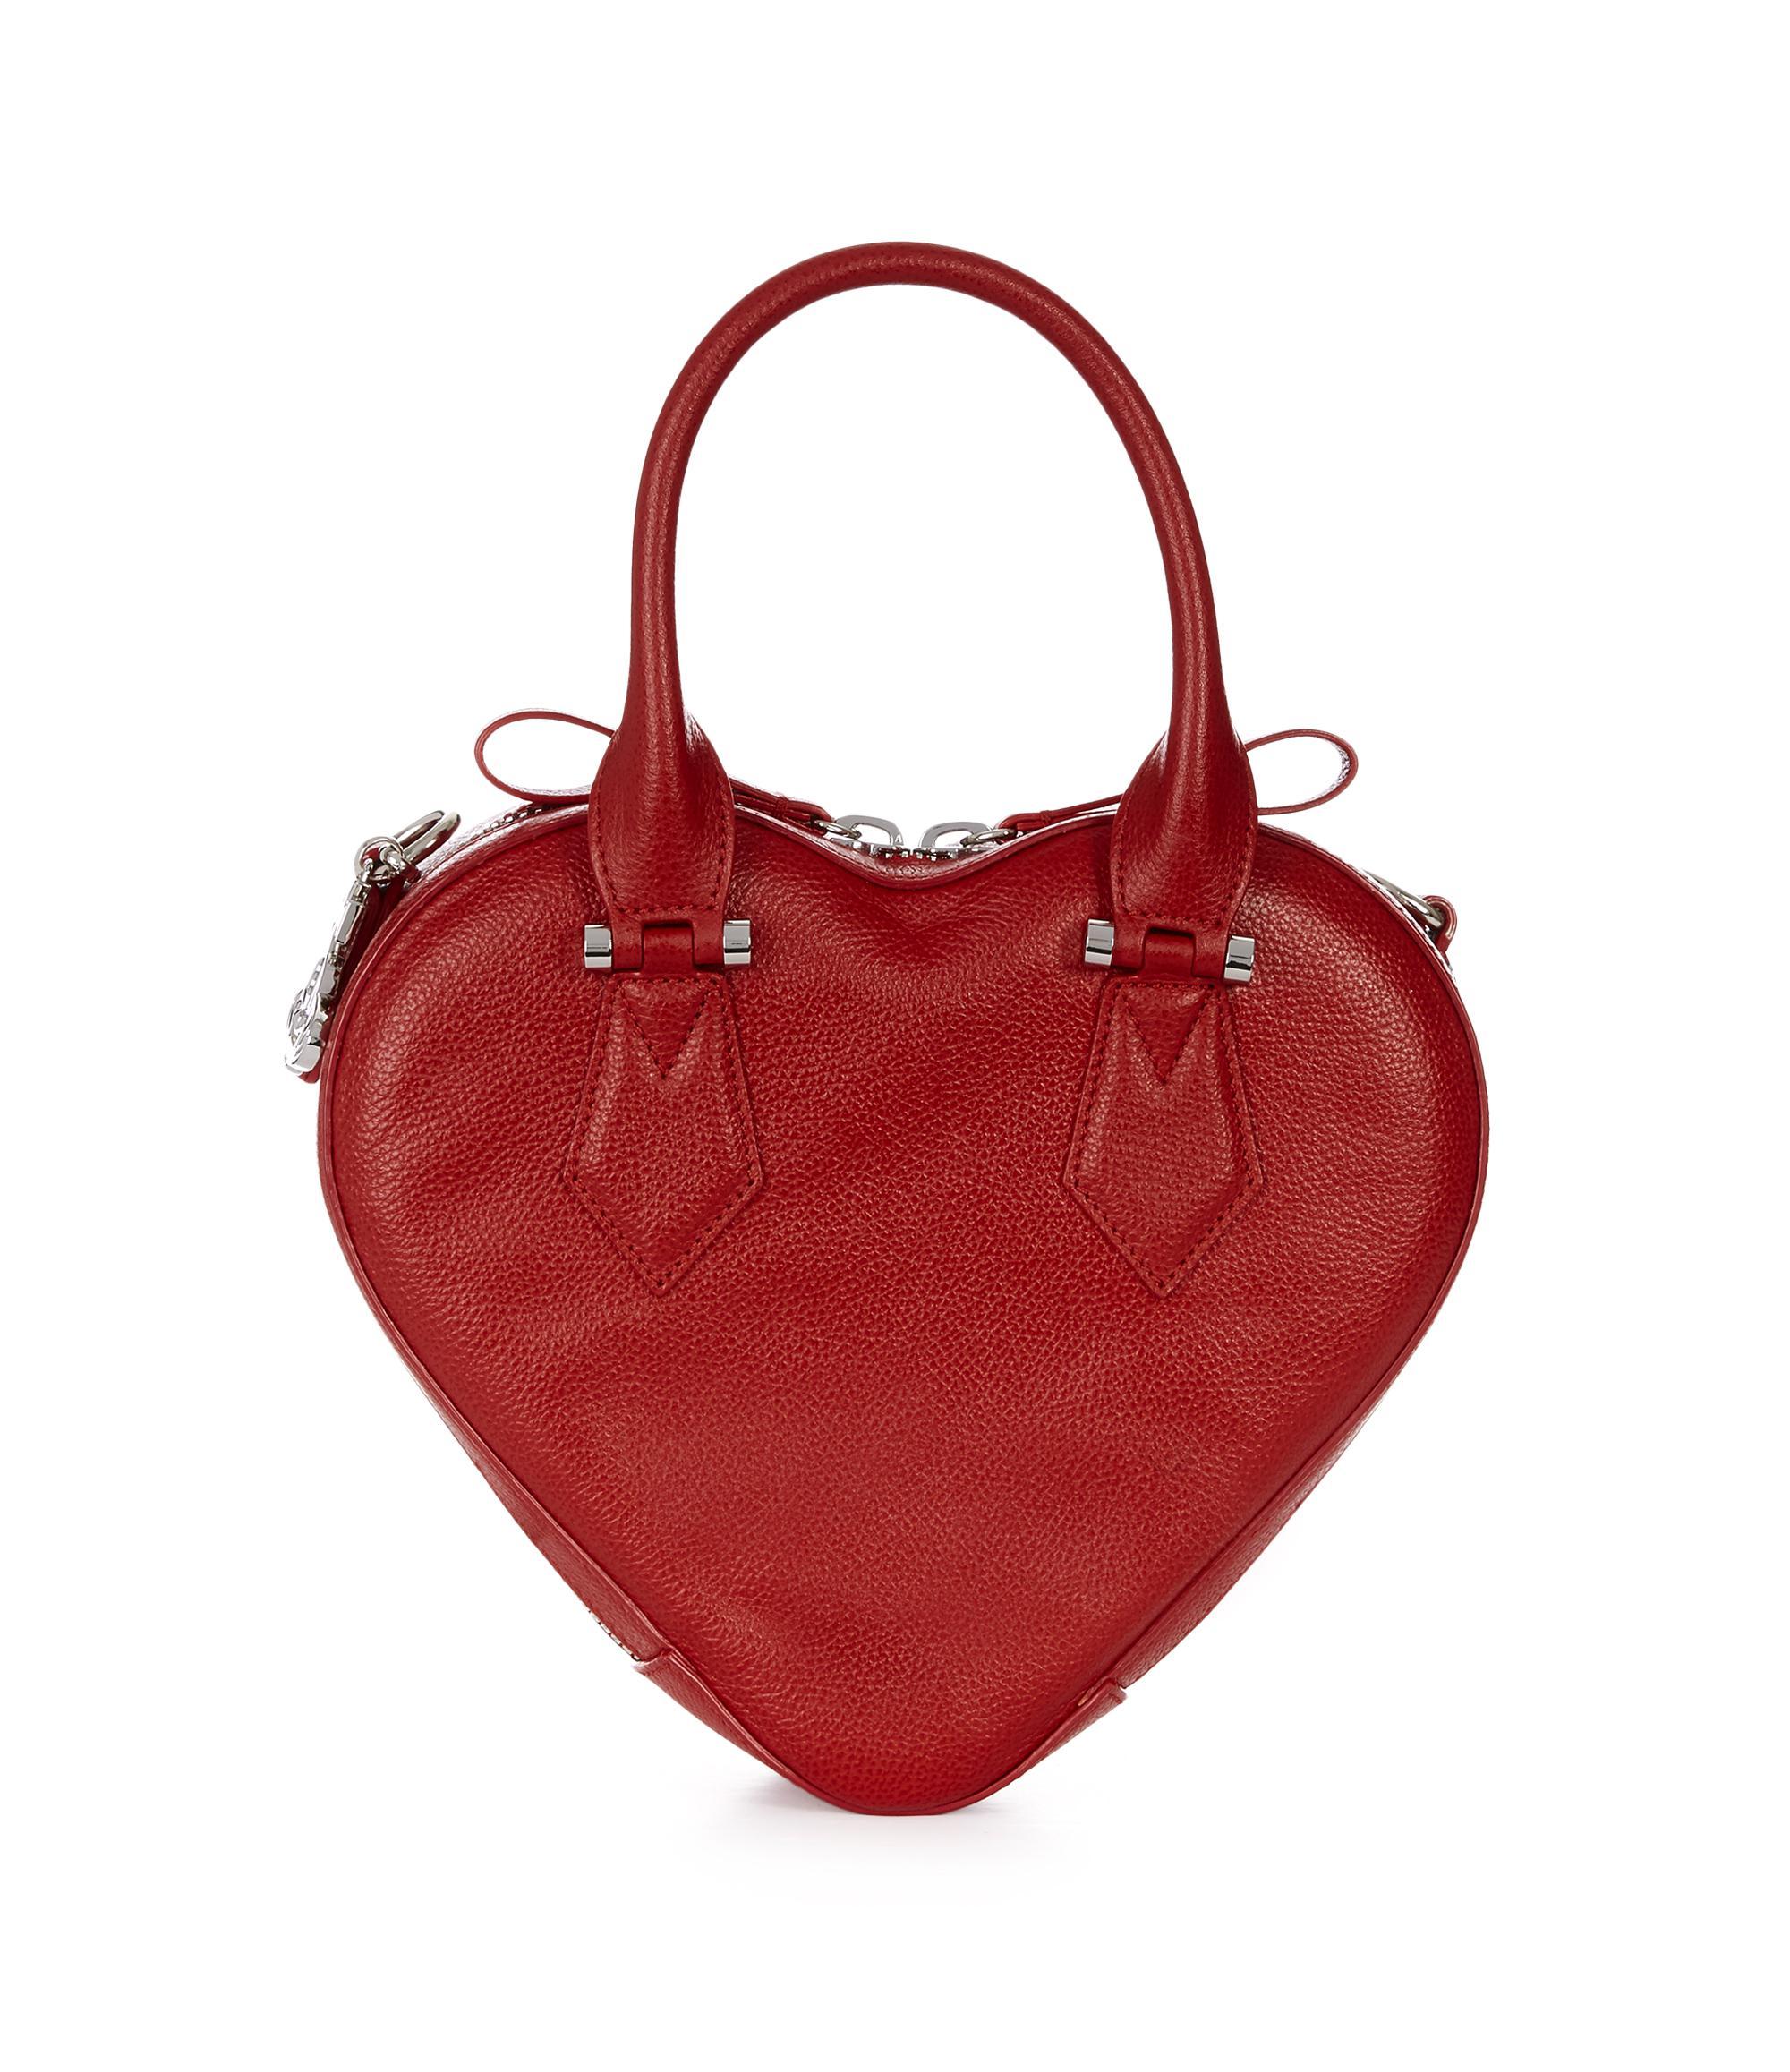 Johanna heart handbag - Red Vivienne Westwood tCnkGZDg